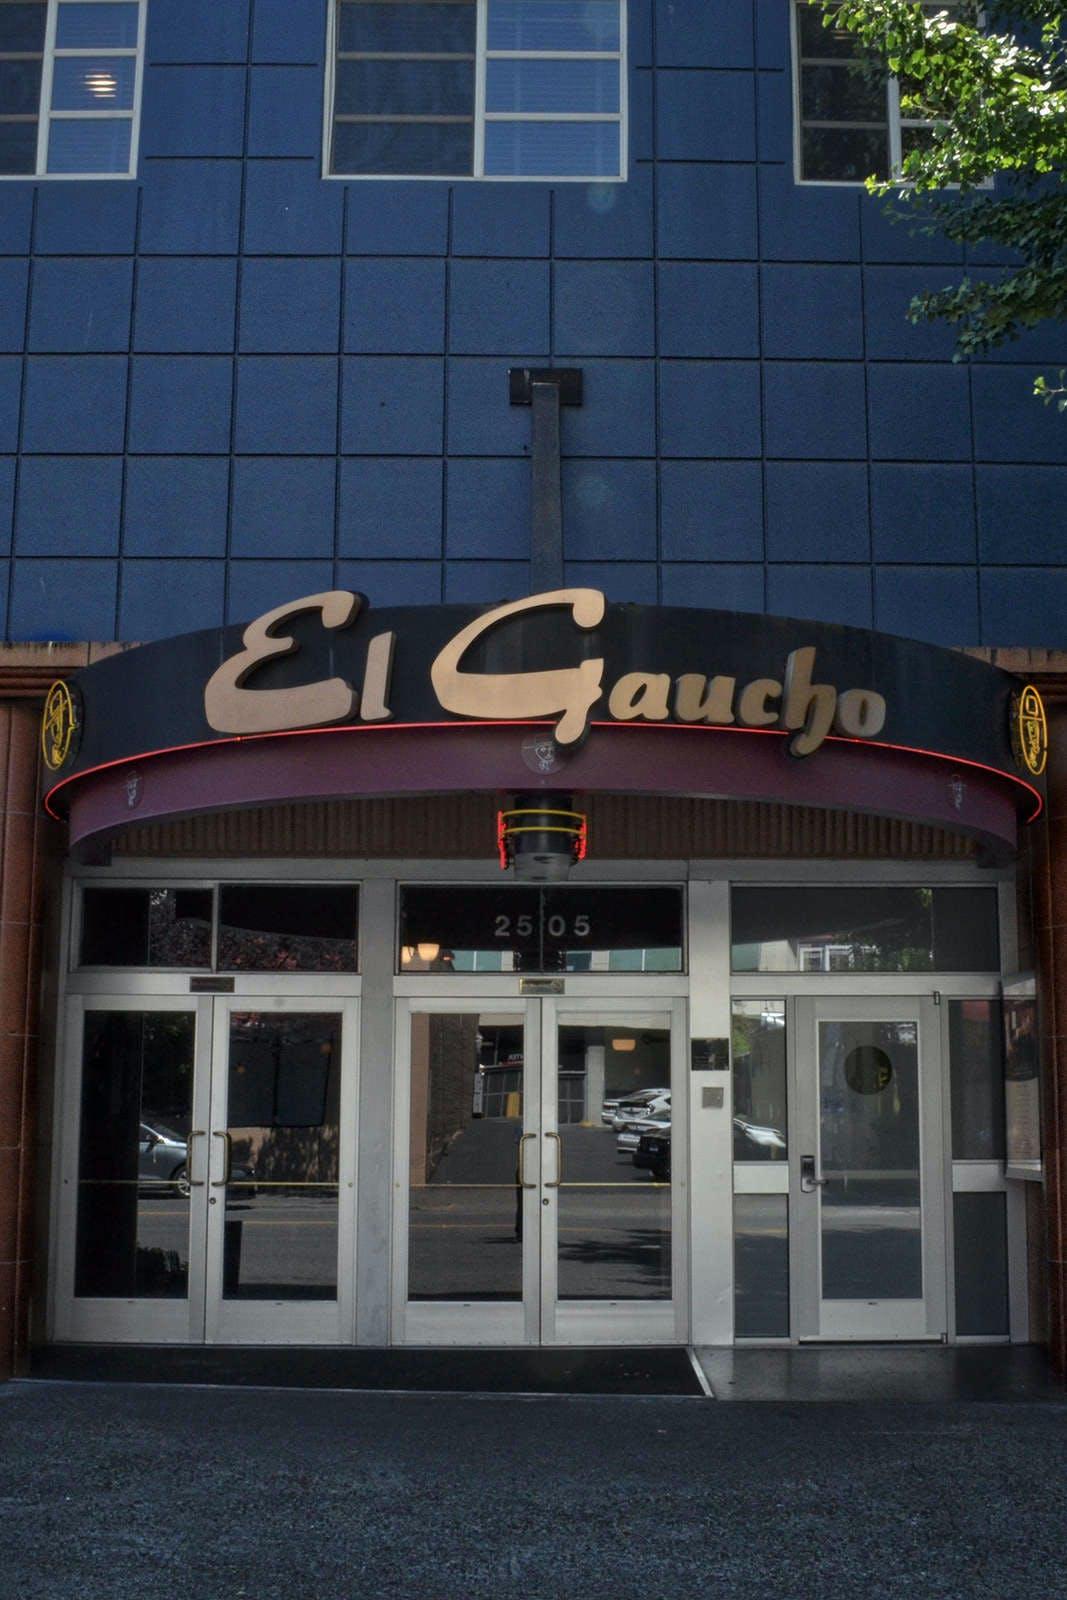 Inn at El Gaucho